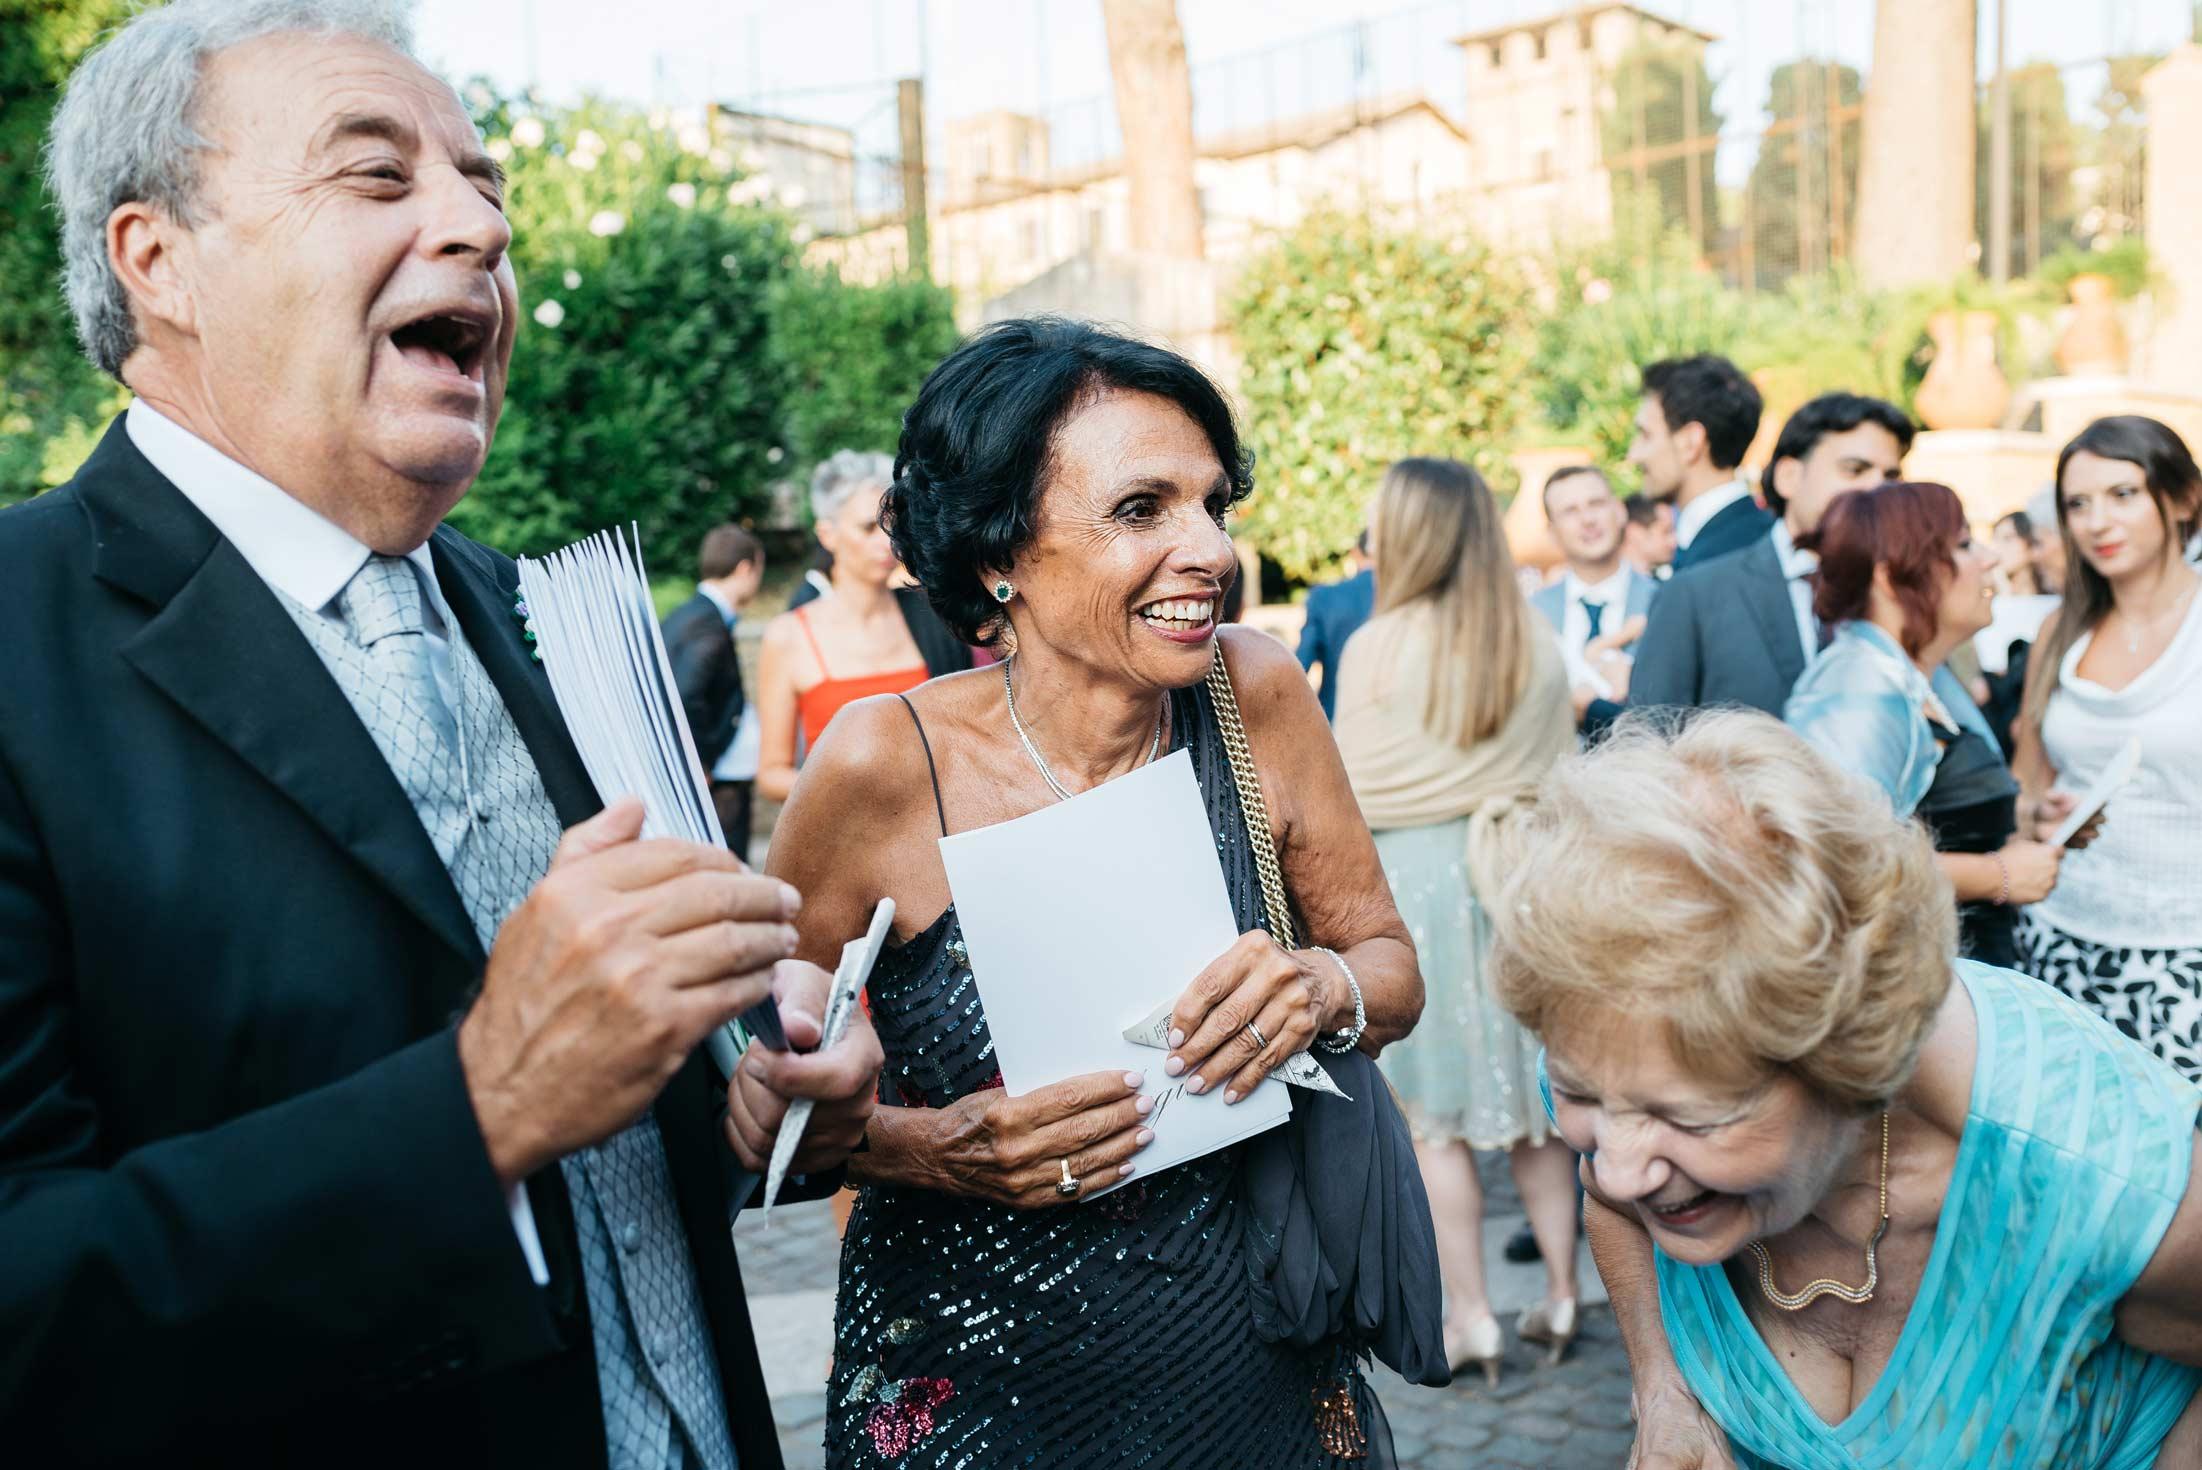 Fotografi-Di-Matrimonio-Stile-Reportage-Cerimonia